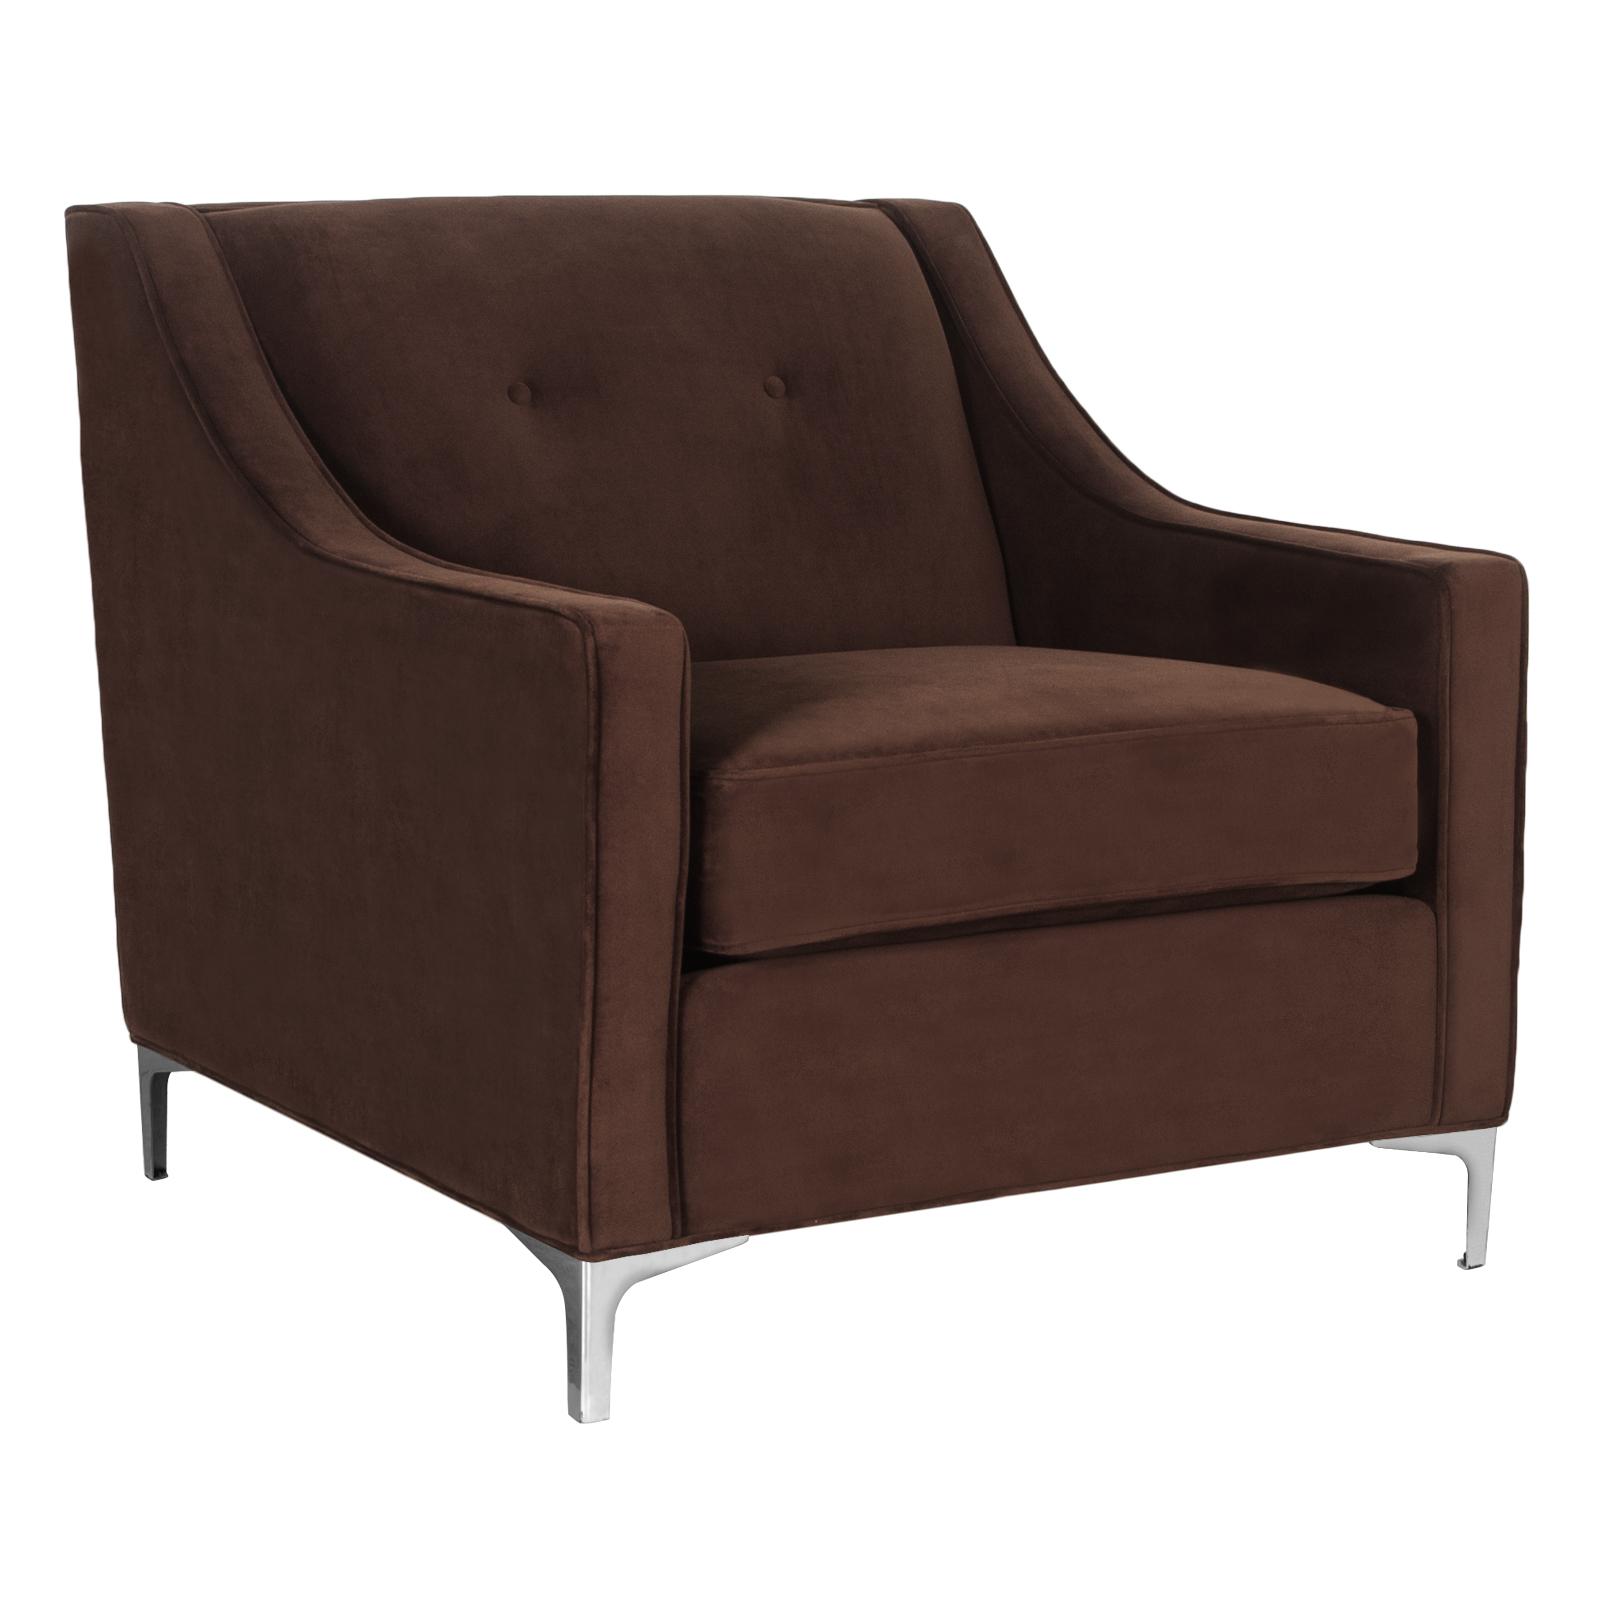 Modern Lounge Chair Rentals